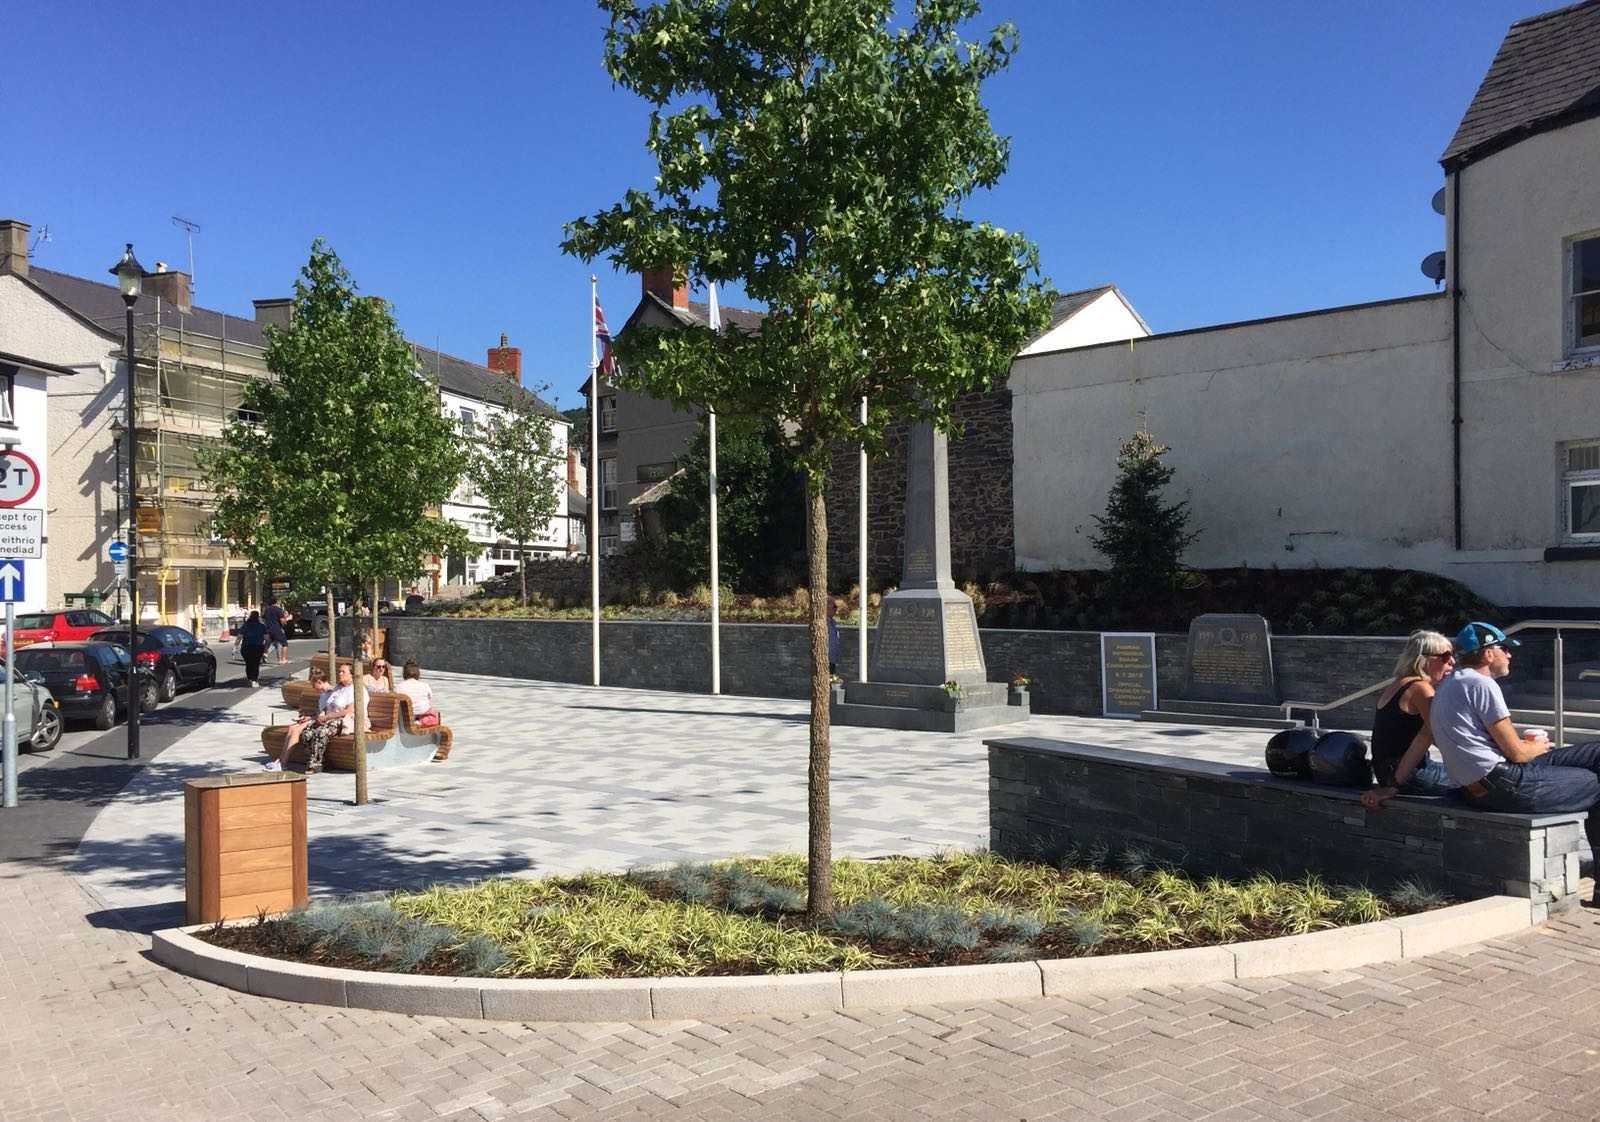 Case Study: Public Realm Re-design at Centenary Square, Llangollen